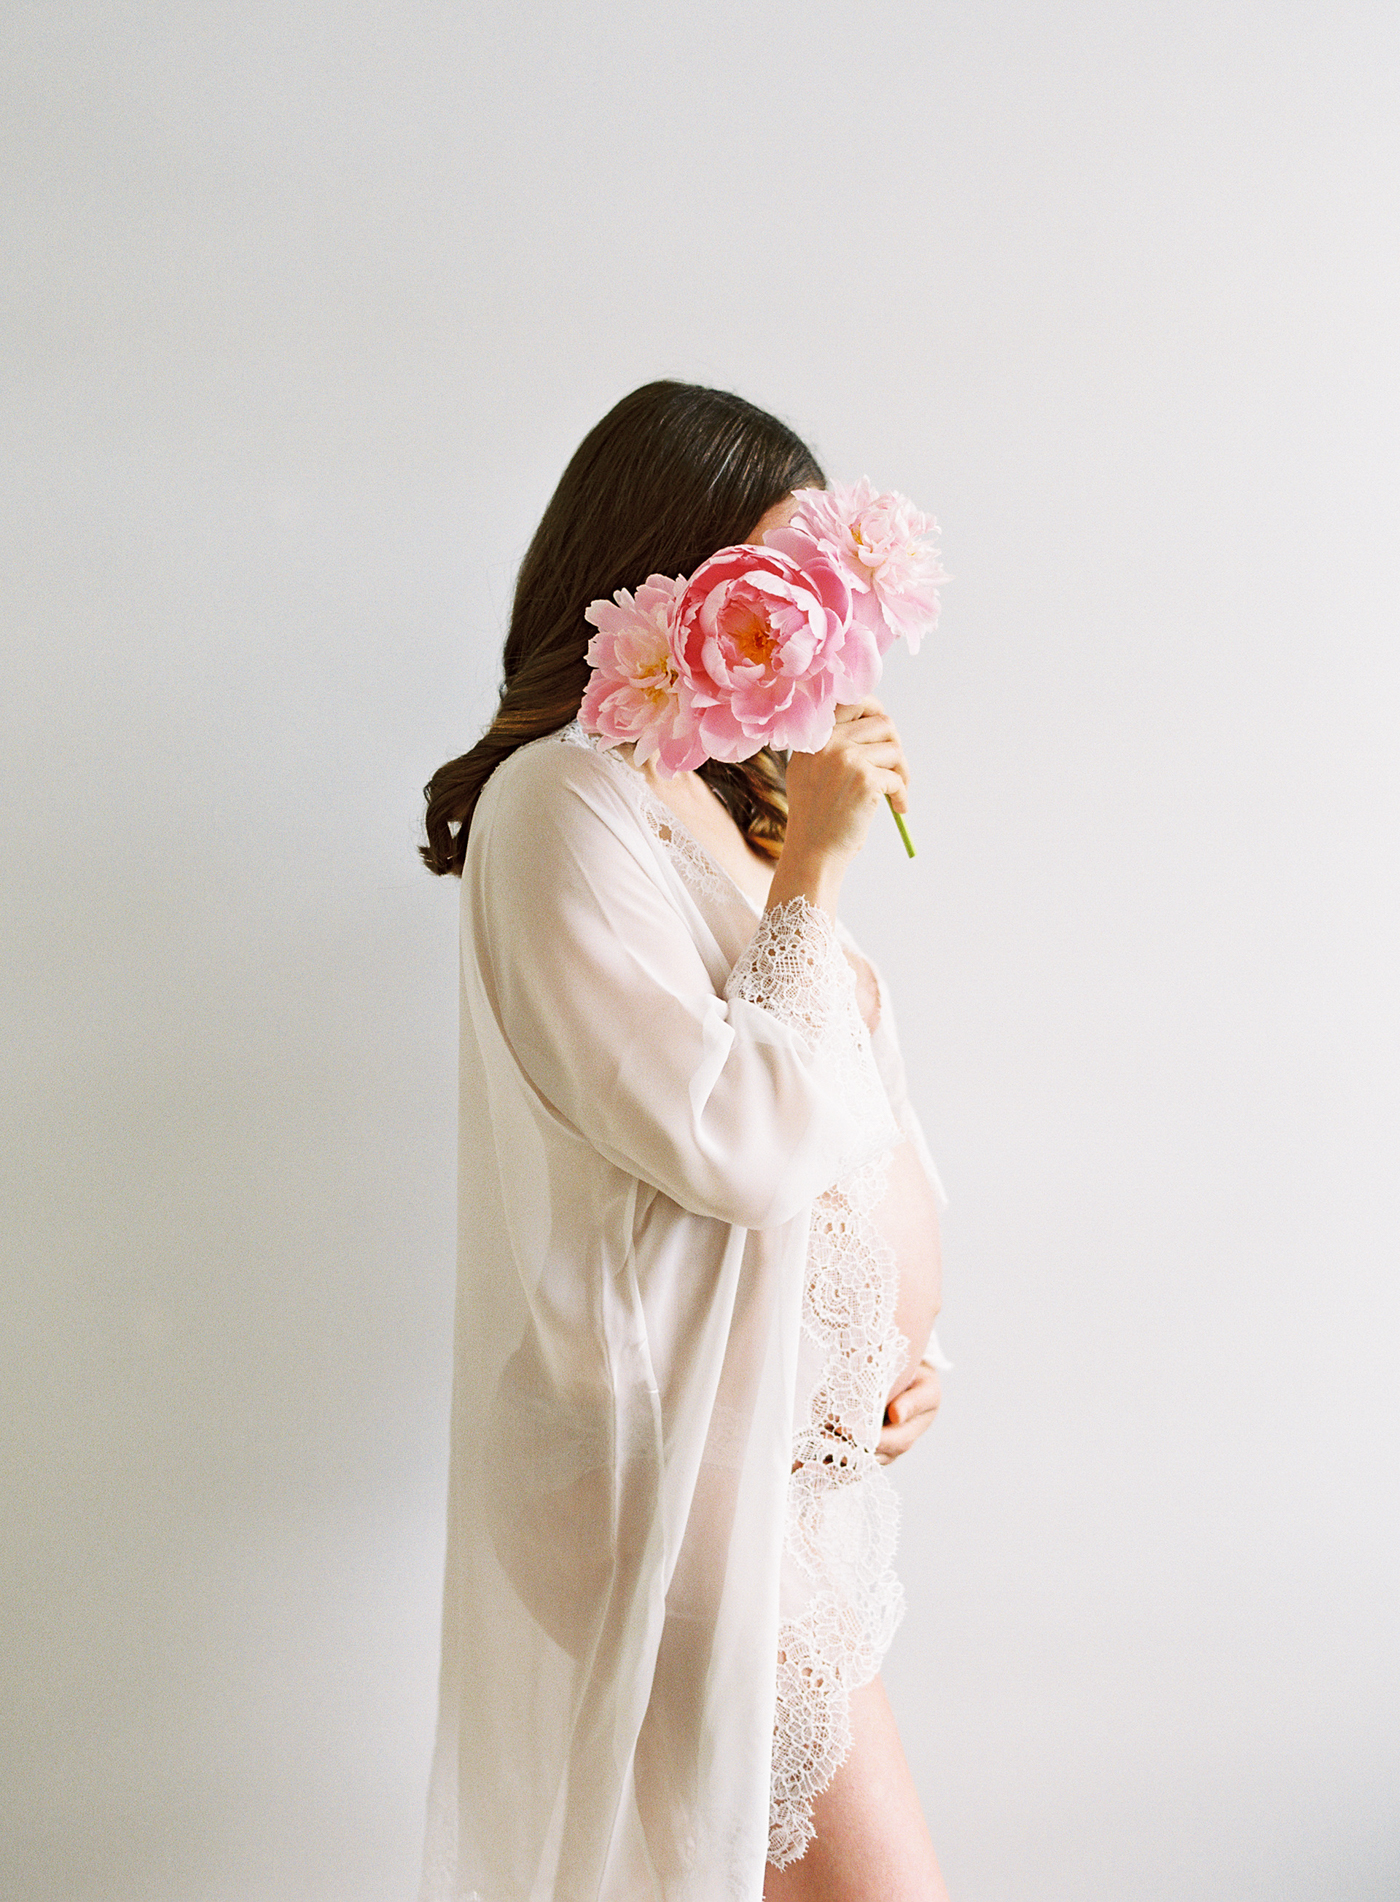 new_city_maternity_photography_Jen_Huang_6_009869-R1-005.jpg